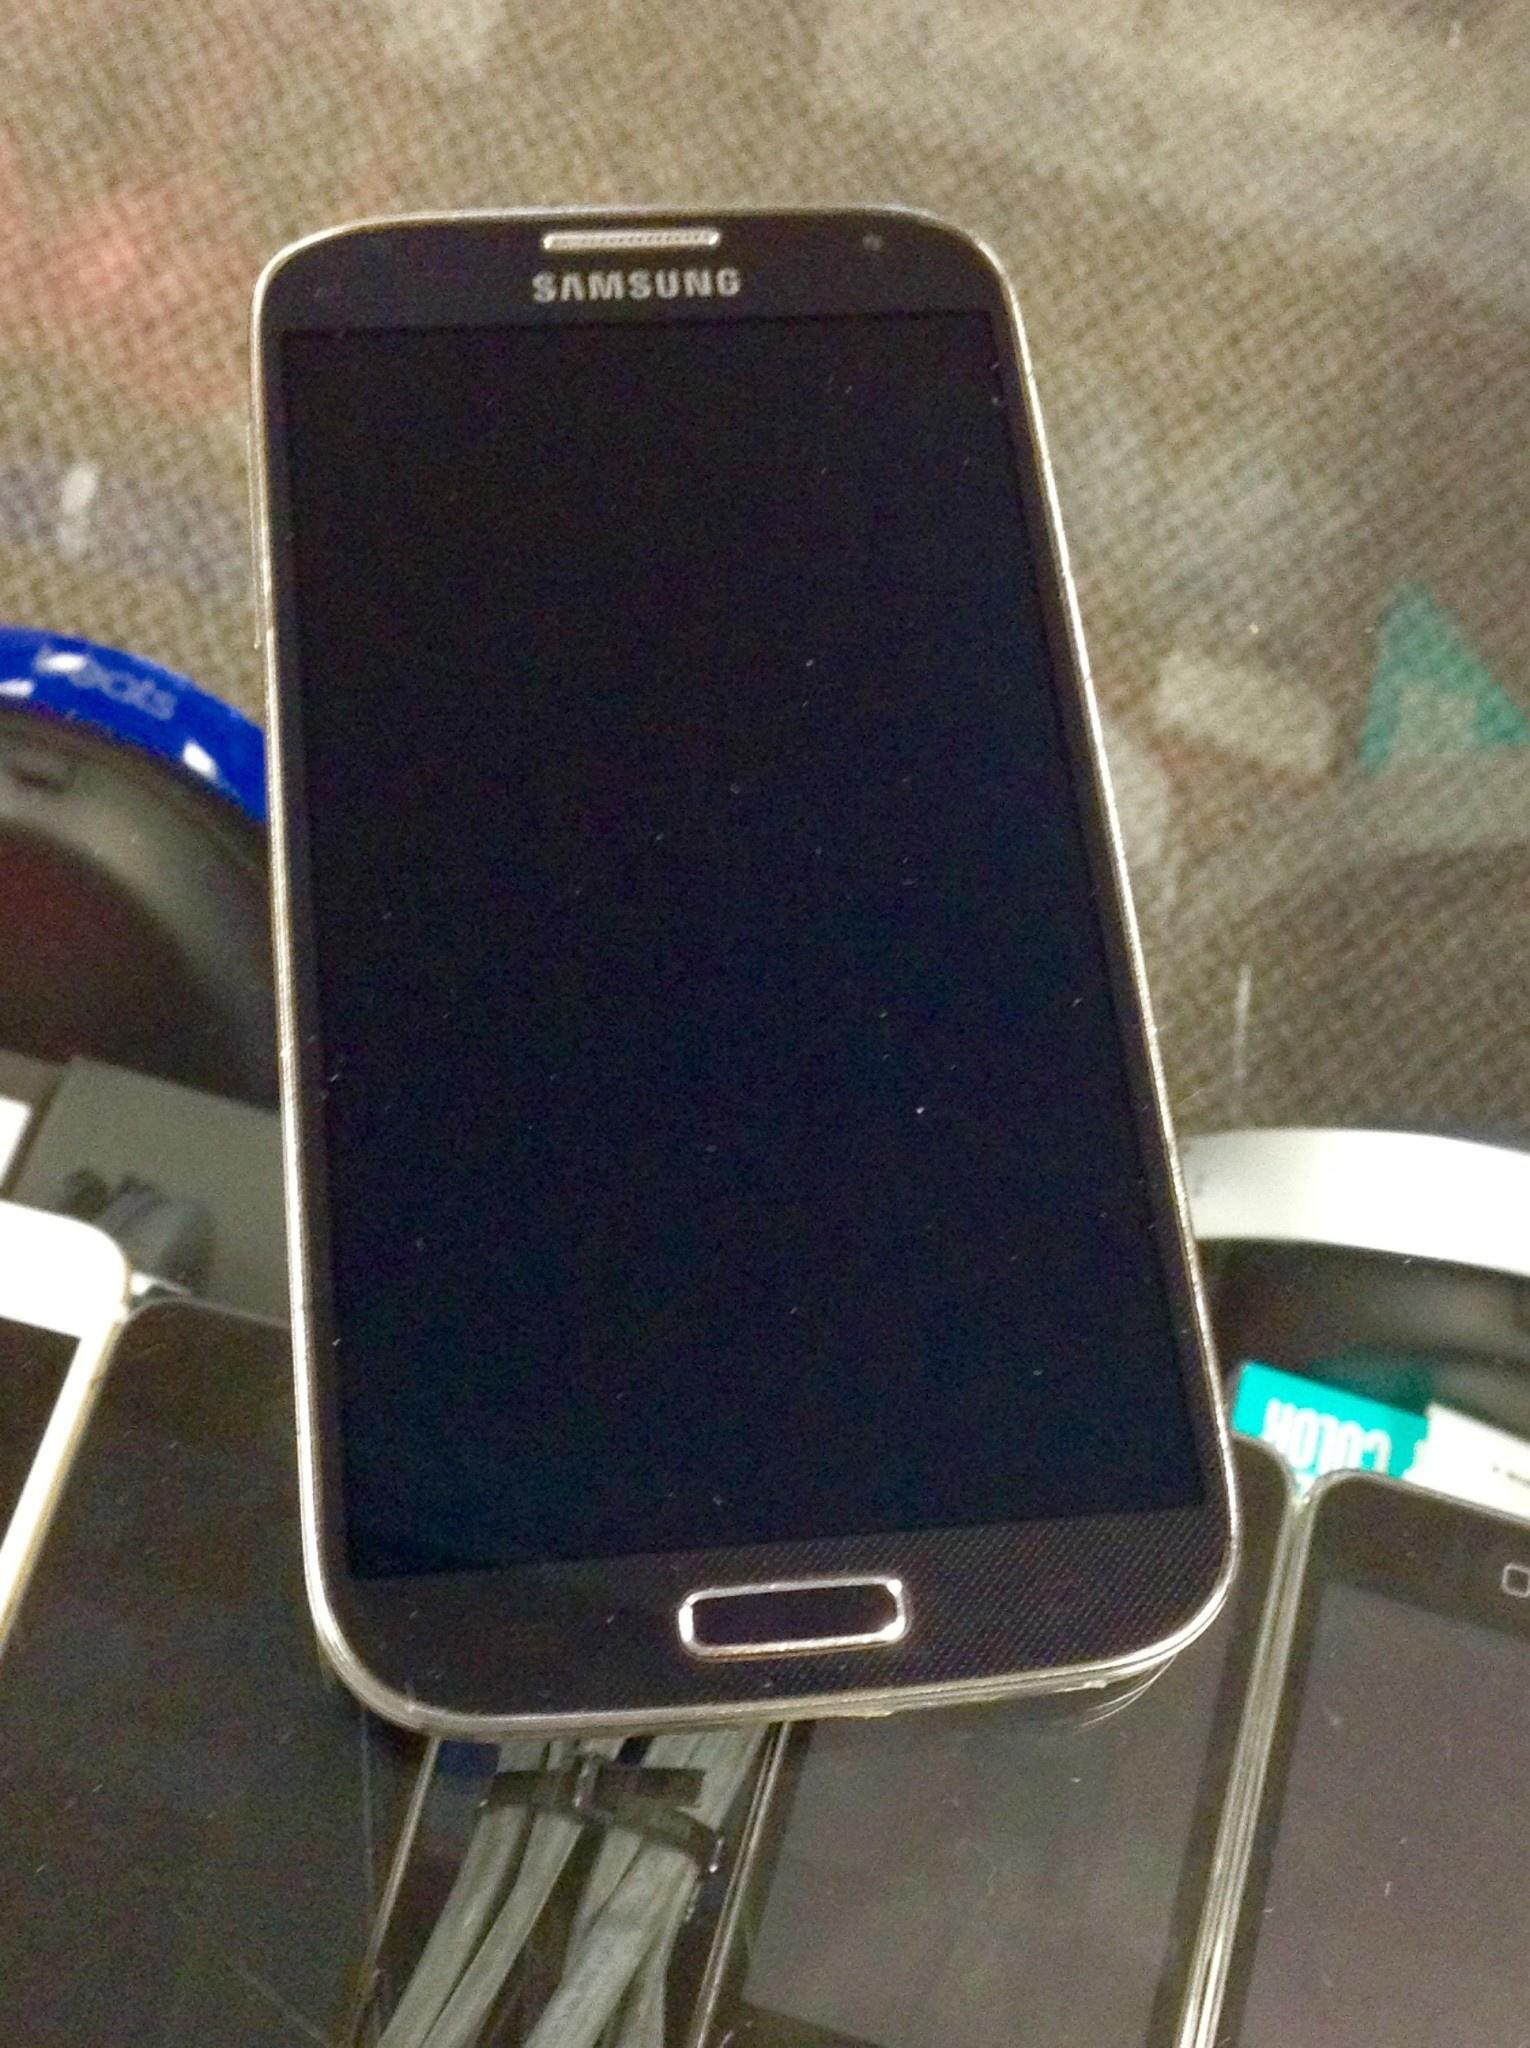 Sprint/Boost - Samsung Galaxy S4 - 16GB